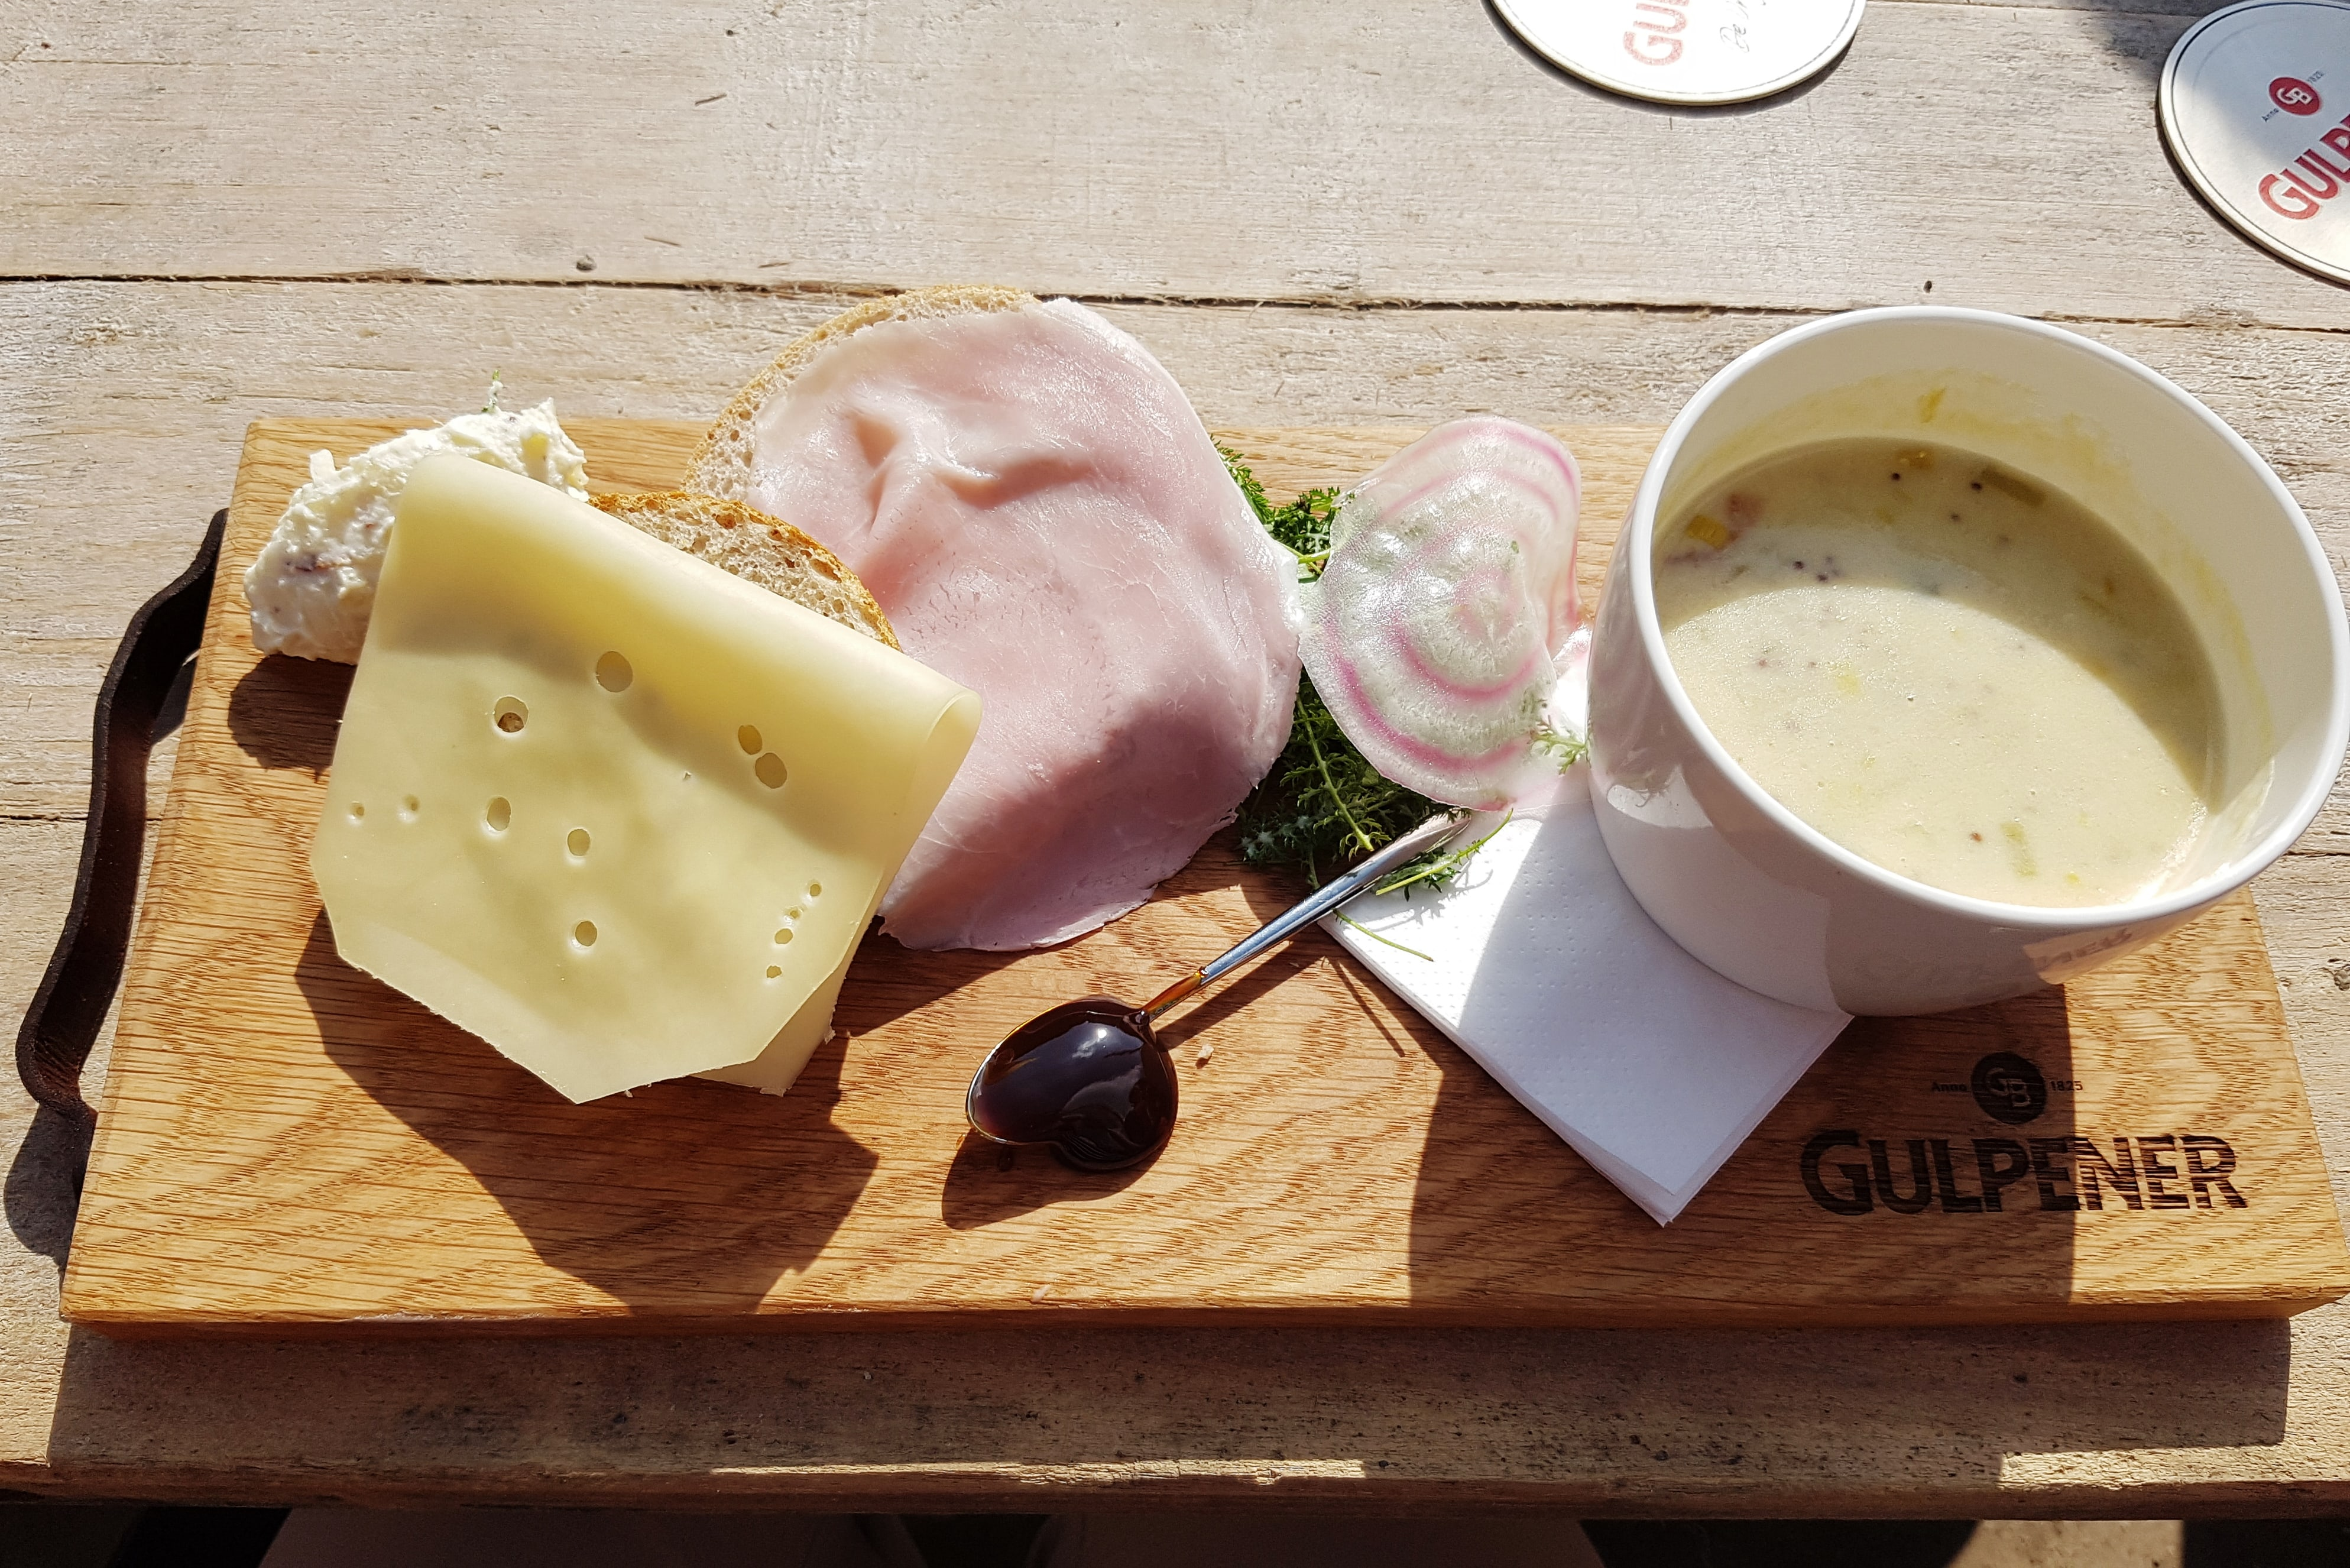 Gulpener bierbrouwerij Gulpen zuid-limburg bier Lisette schrijft